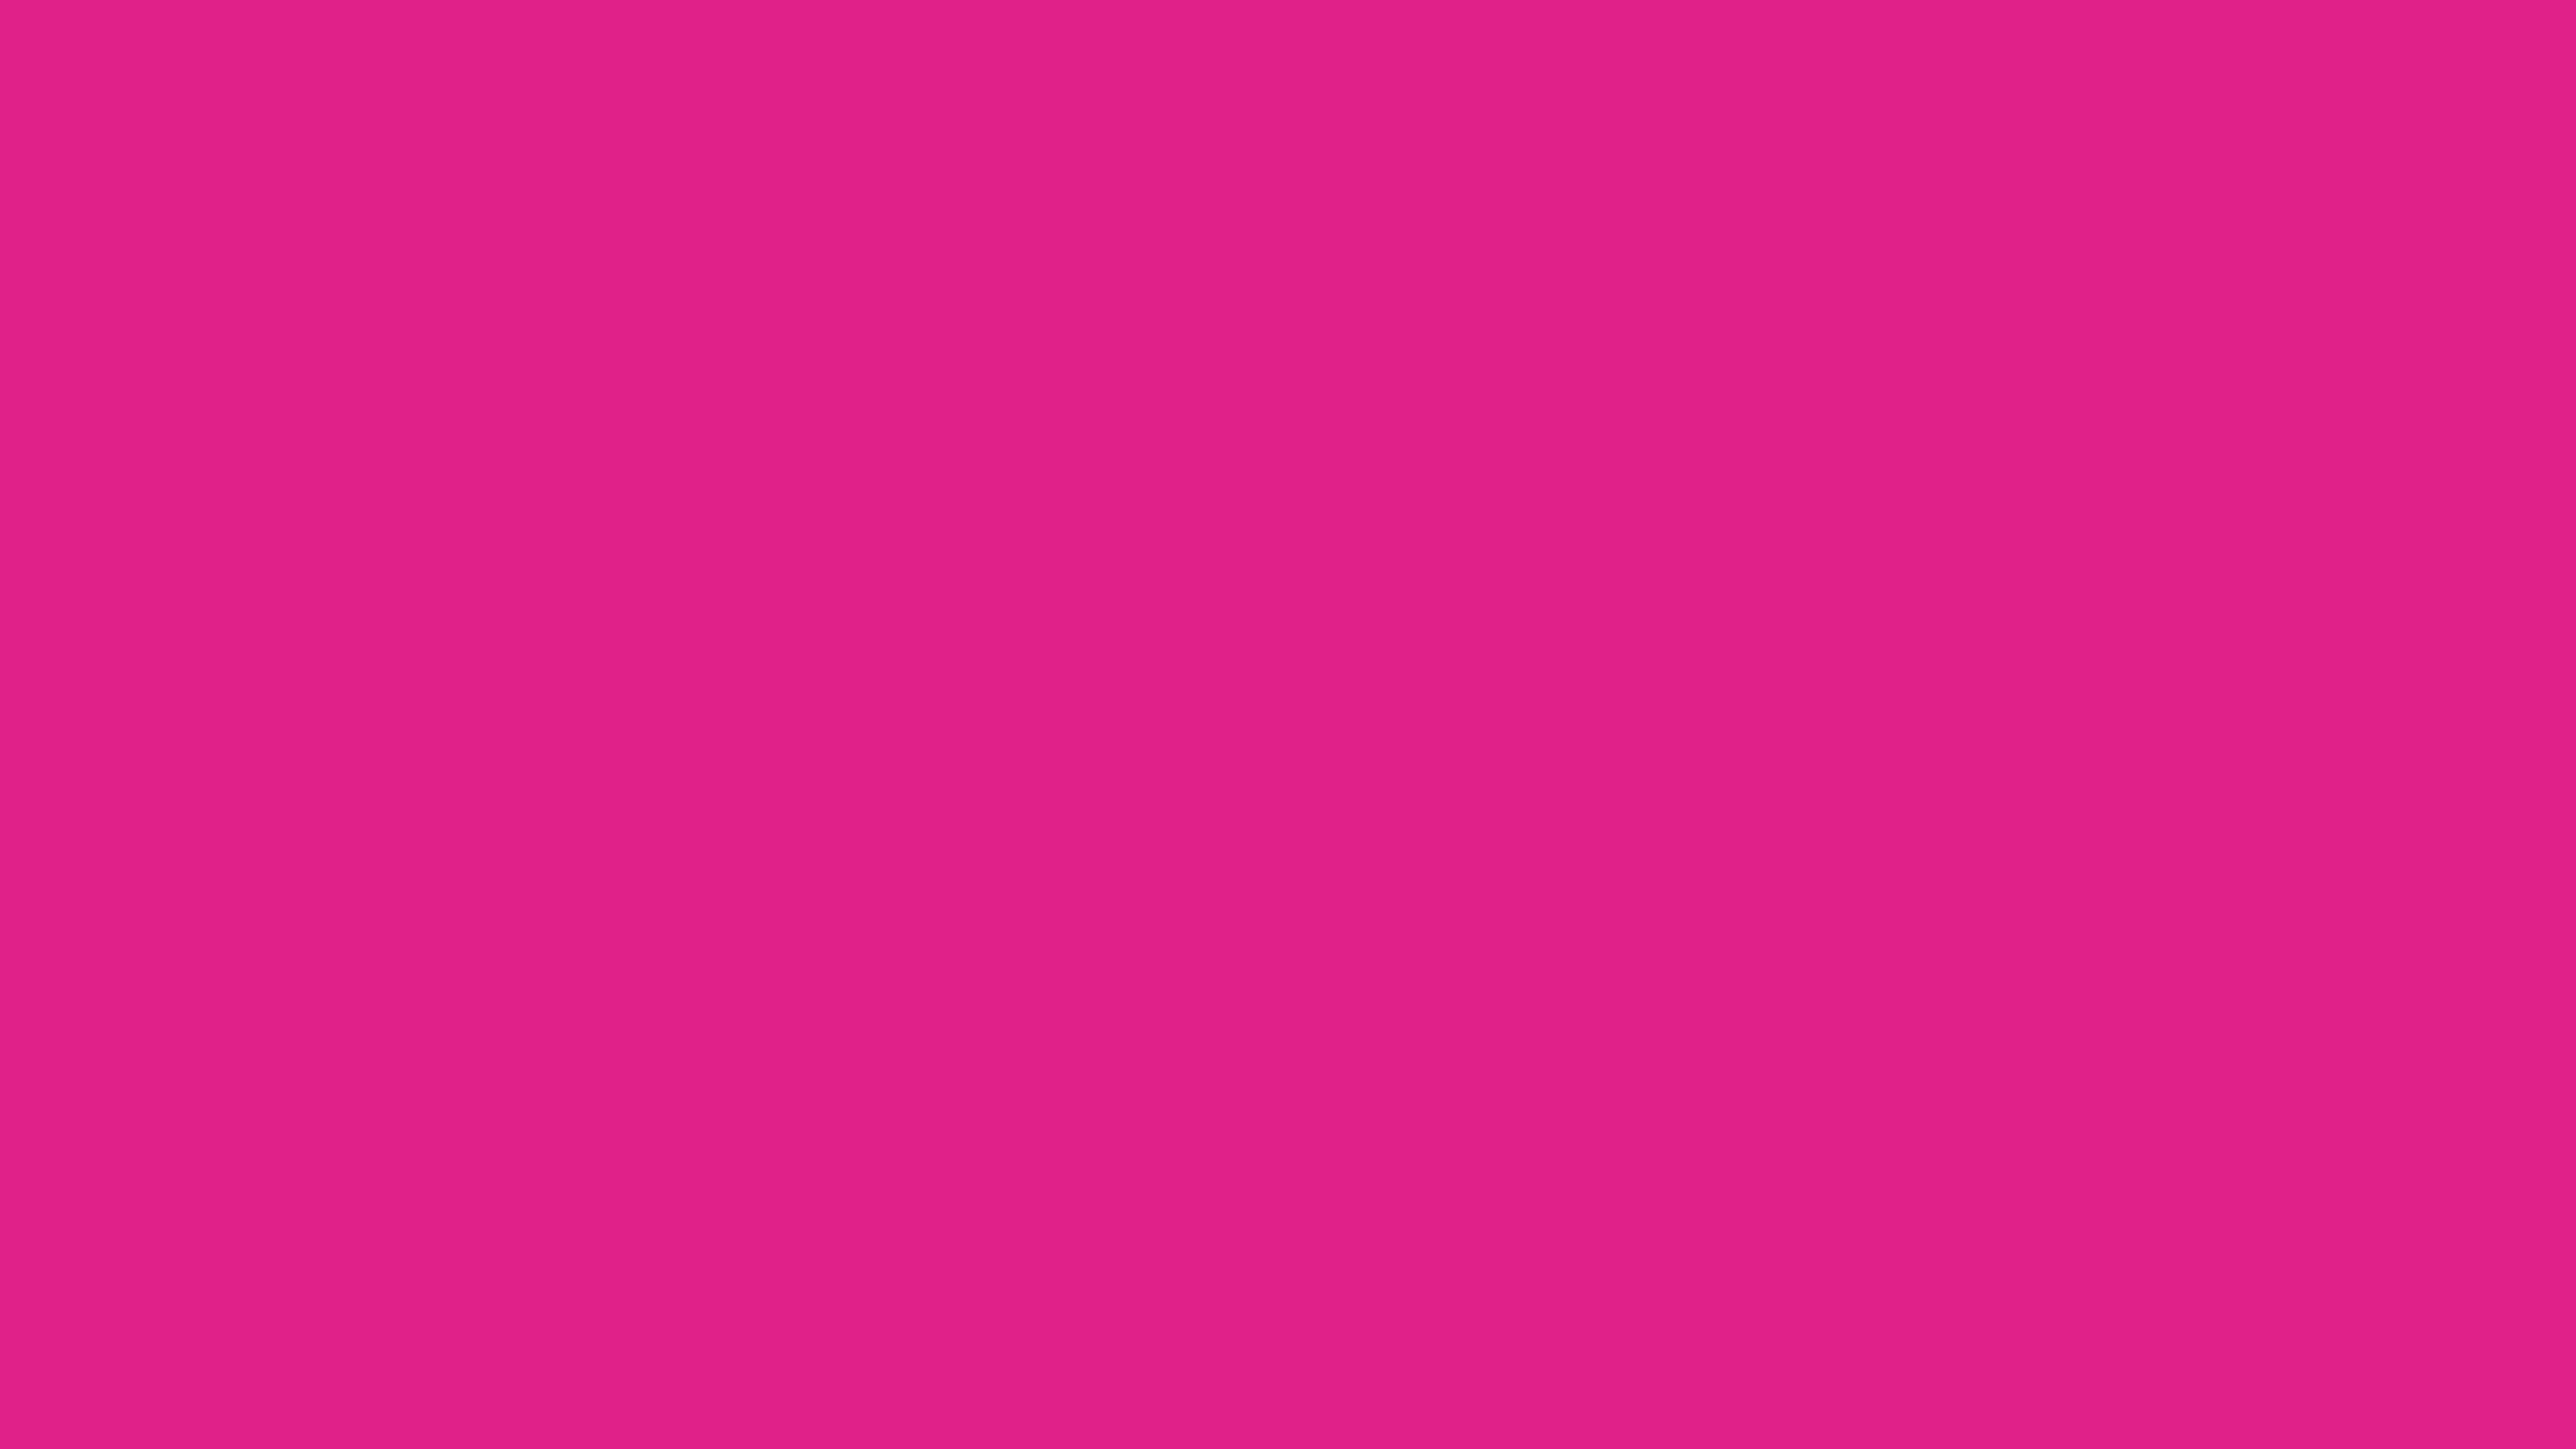 4096x2304 Barbie Pink Solid Color Background